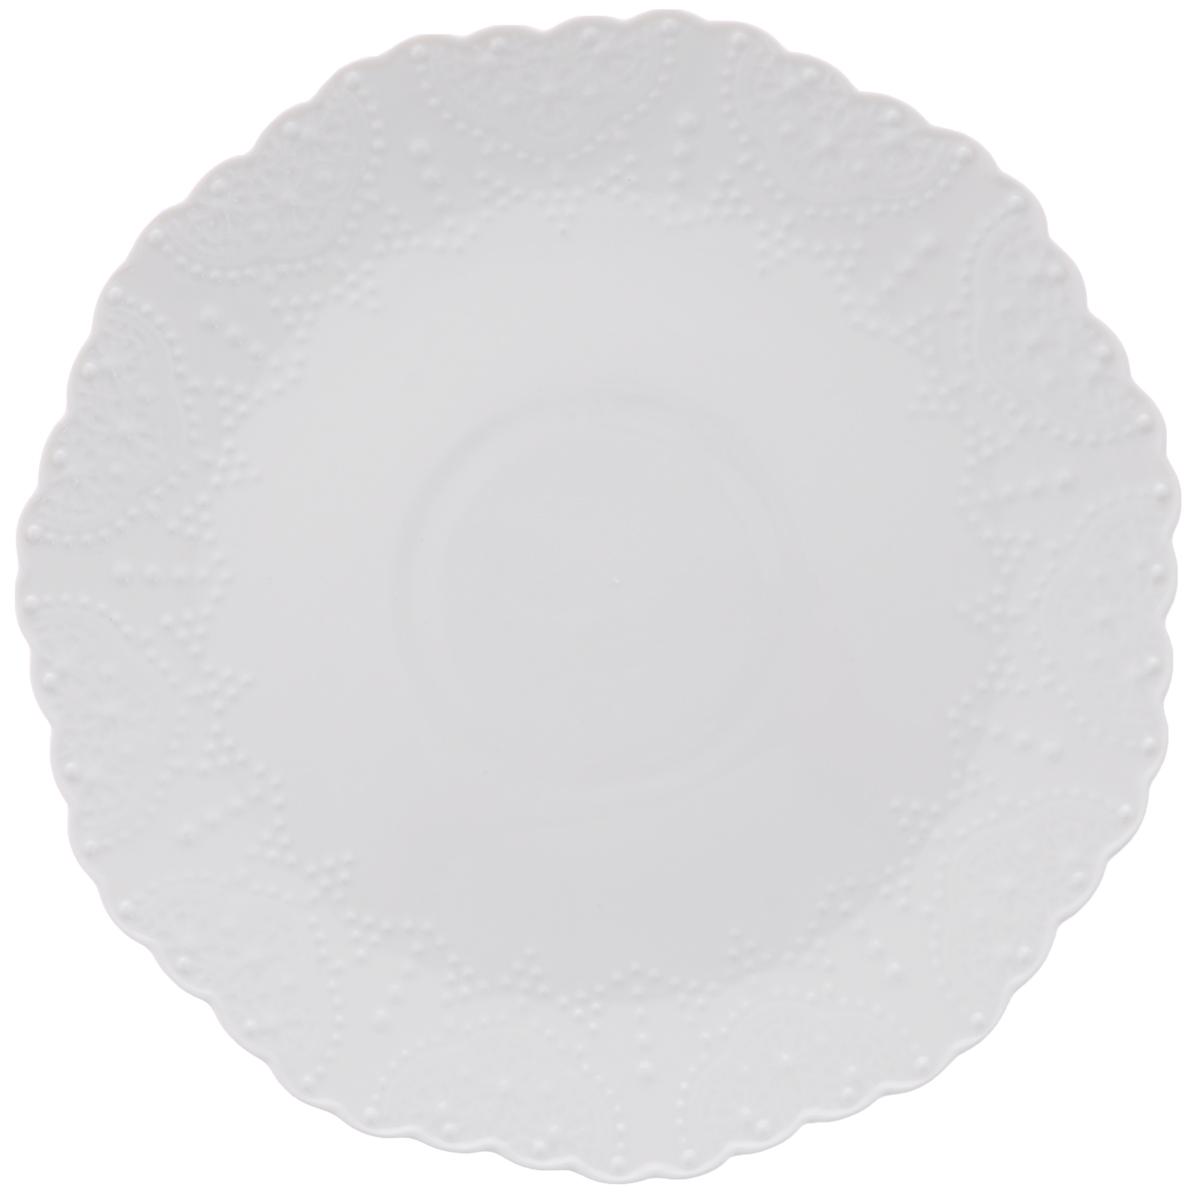 Тарелка обеденная Walmer Vivien, цвет: белый, диаметр 26 см тарелка обеденная terracotta дерево жизни диаметр 26 см